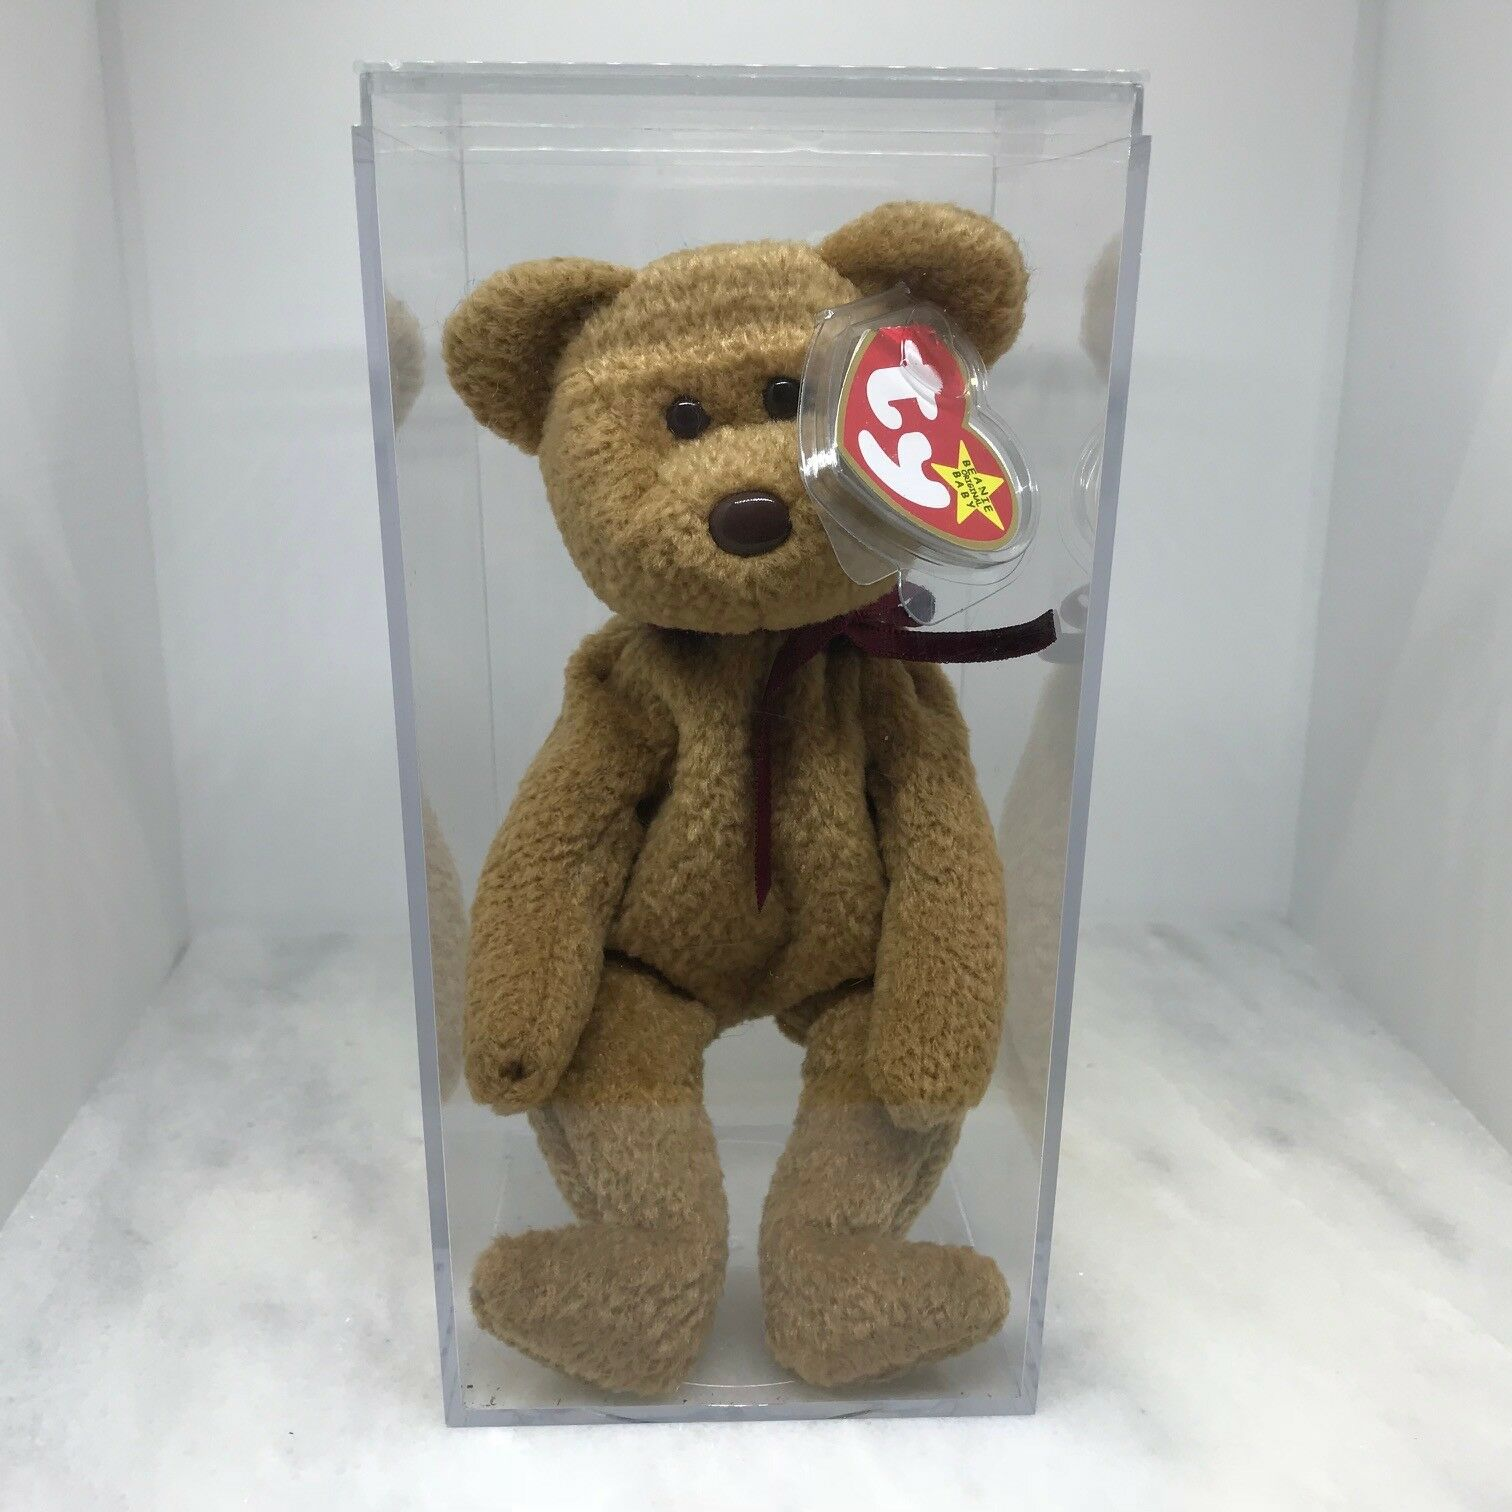 Pensionerad Original Beanie bebis, Cubbie 1993, Tags and låda inkluderad.